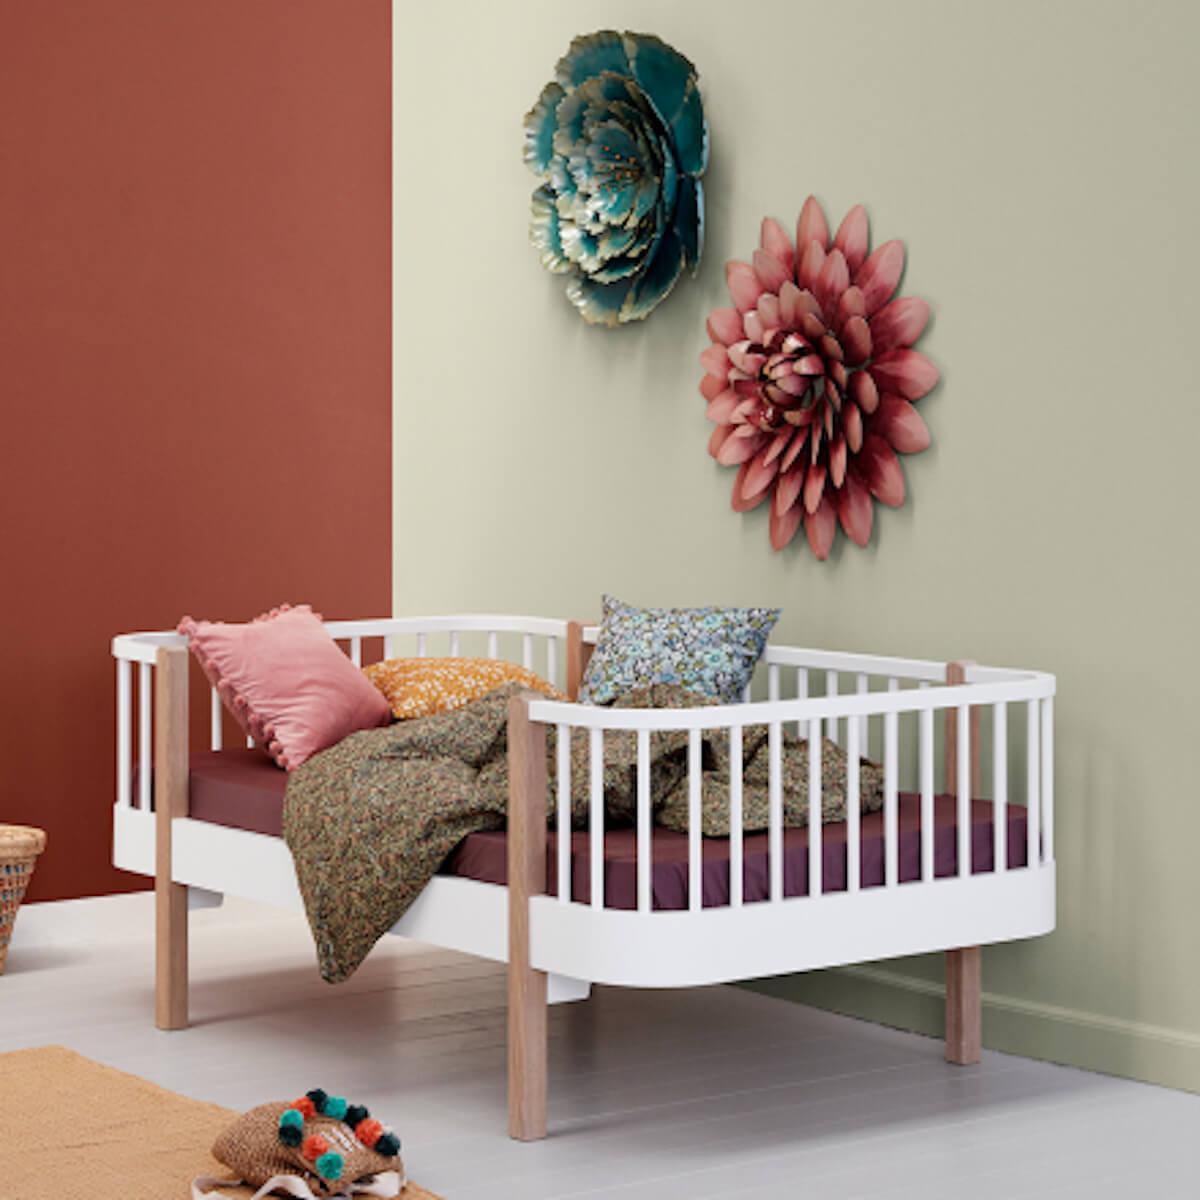 Cama sofá evolutiva 90x160cm WOOD Oliver Furniture blanco-roble